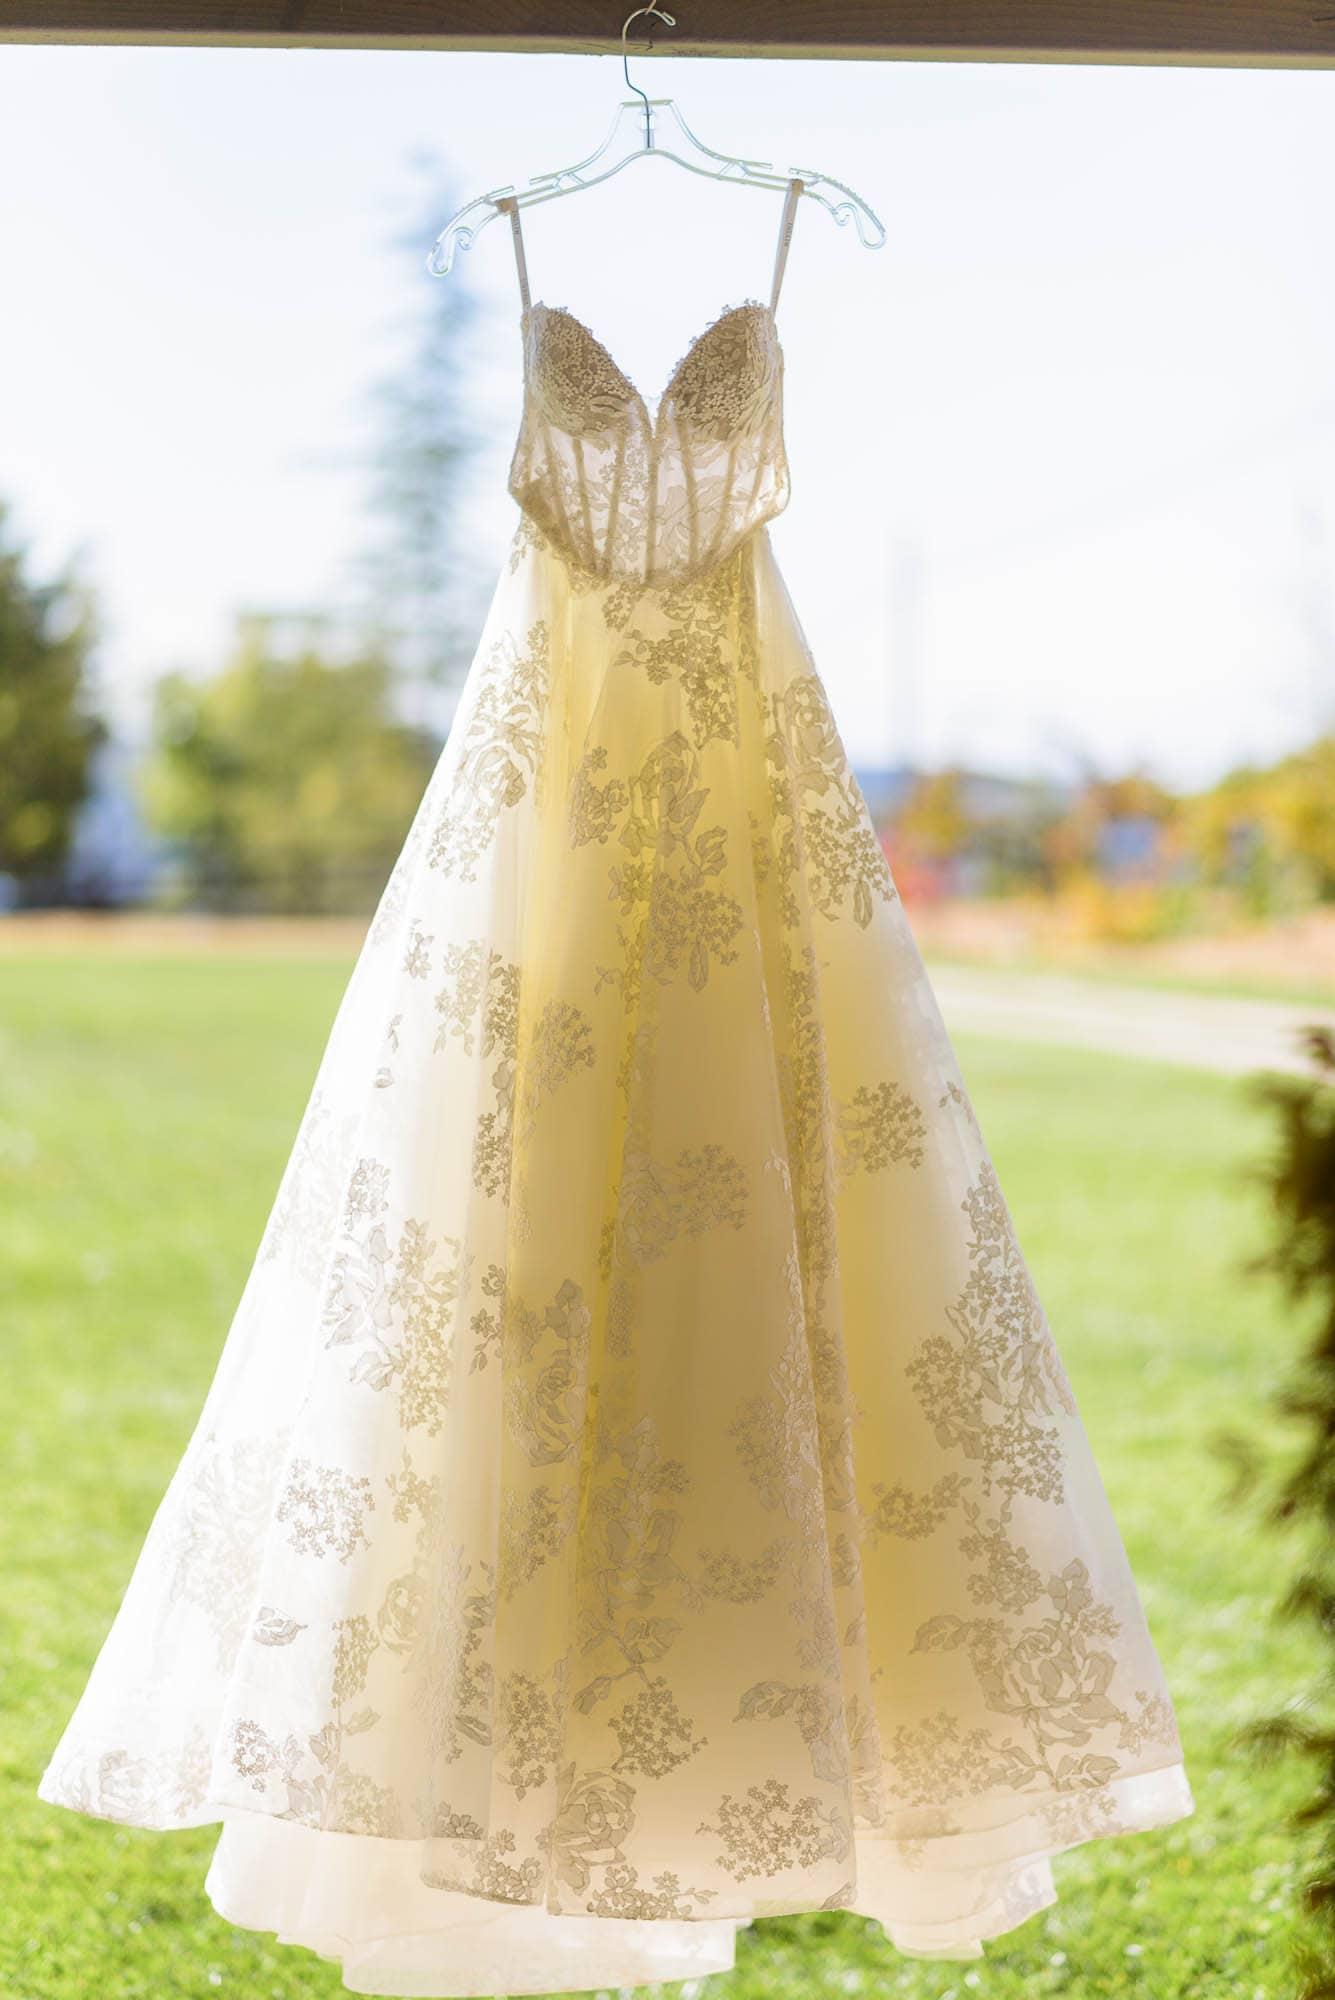 009_Alan_and_Heidi_Serendipity_Garden_Wedding_10-27-2018